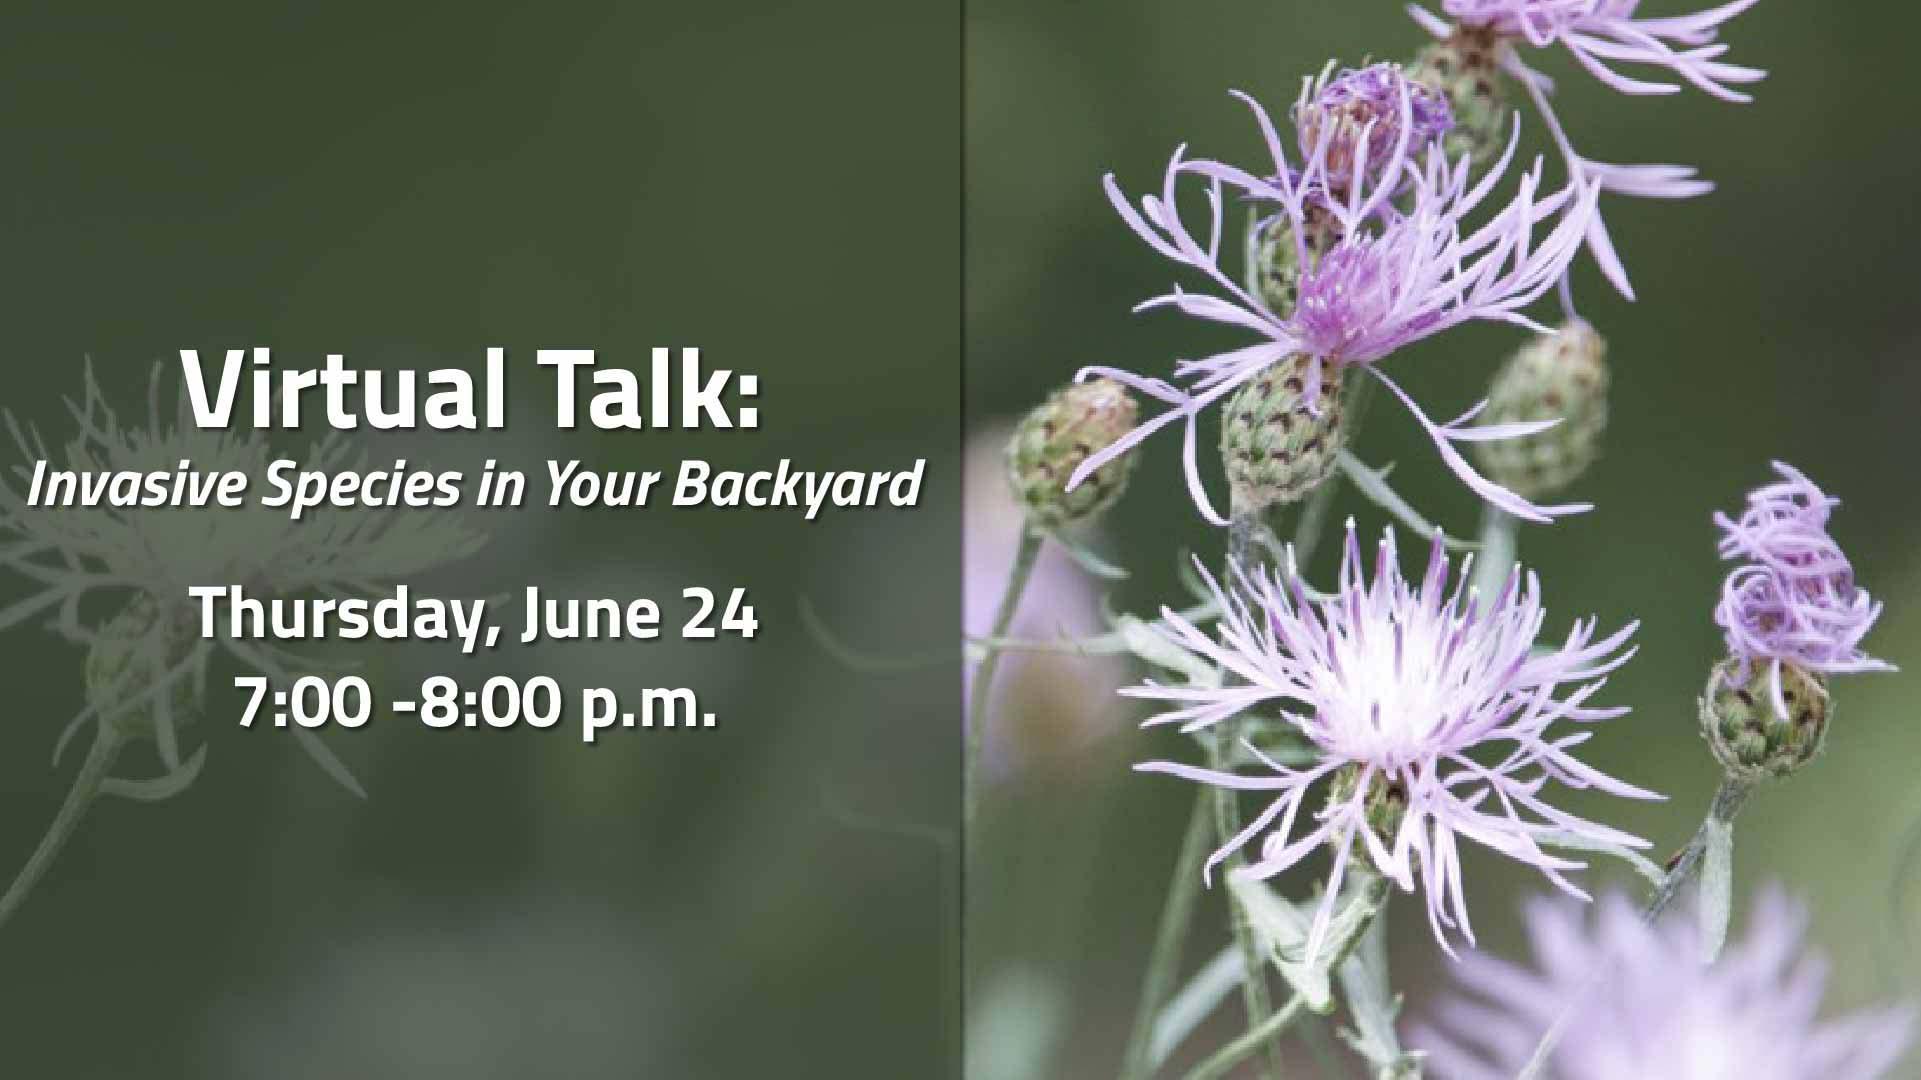 Invasive Species in your Backyard event image